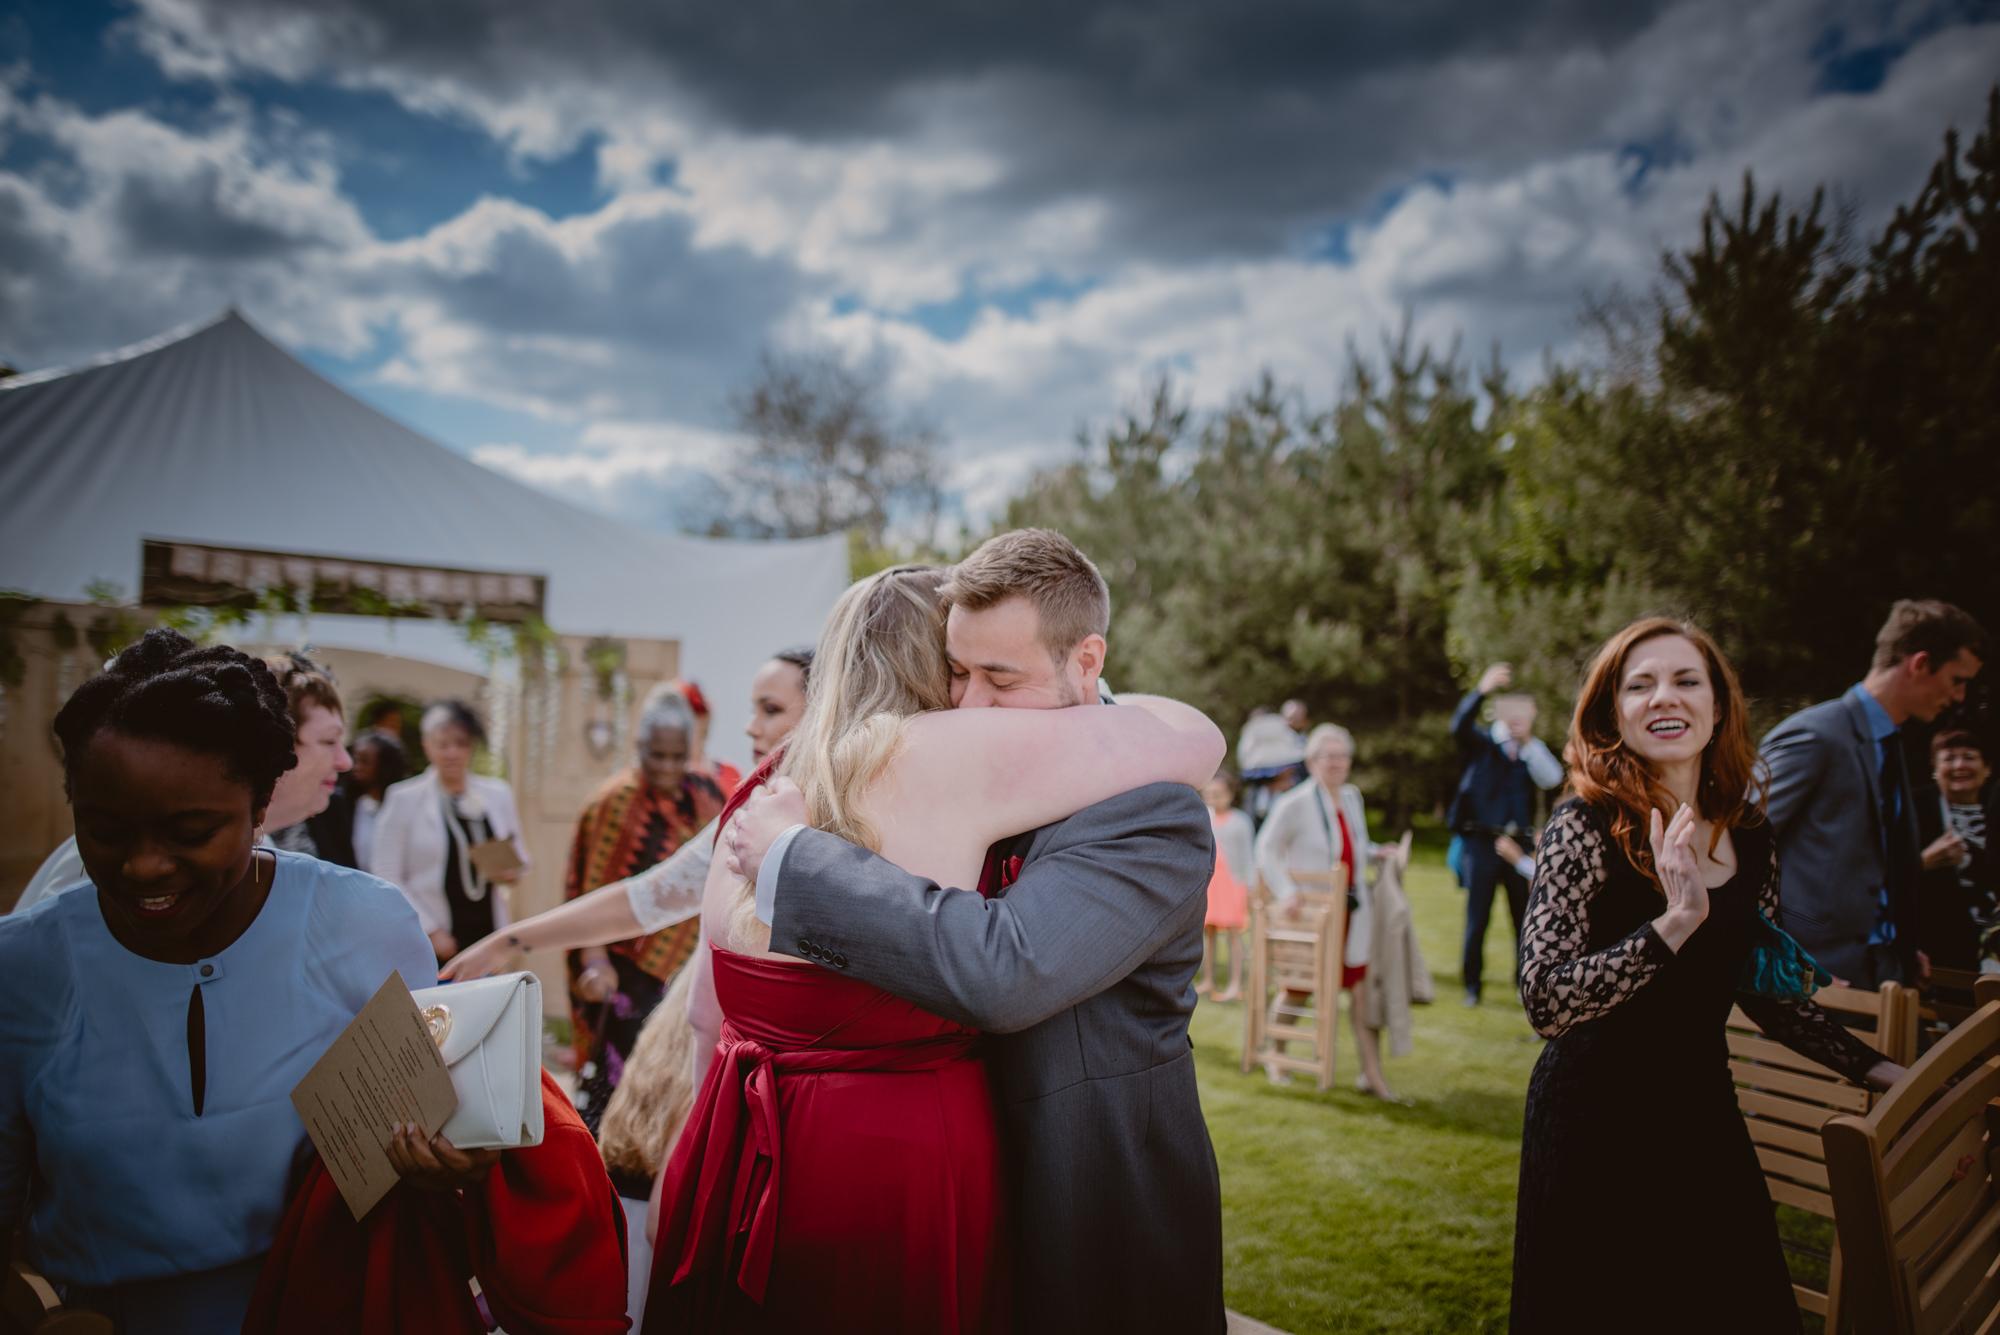 Jacqueline-Gareth-Wedding-Westmead-Events-Surrey-Manu-Mendoza-Wedding-Photography-290.jpg